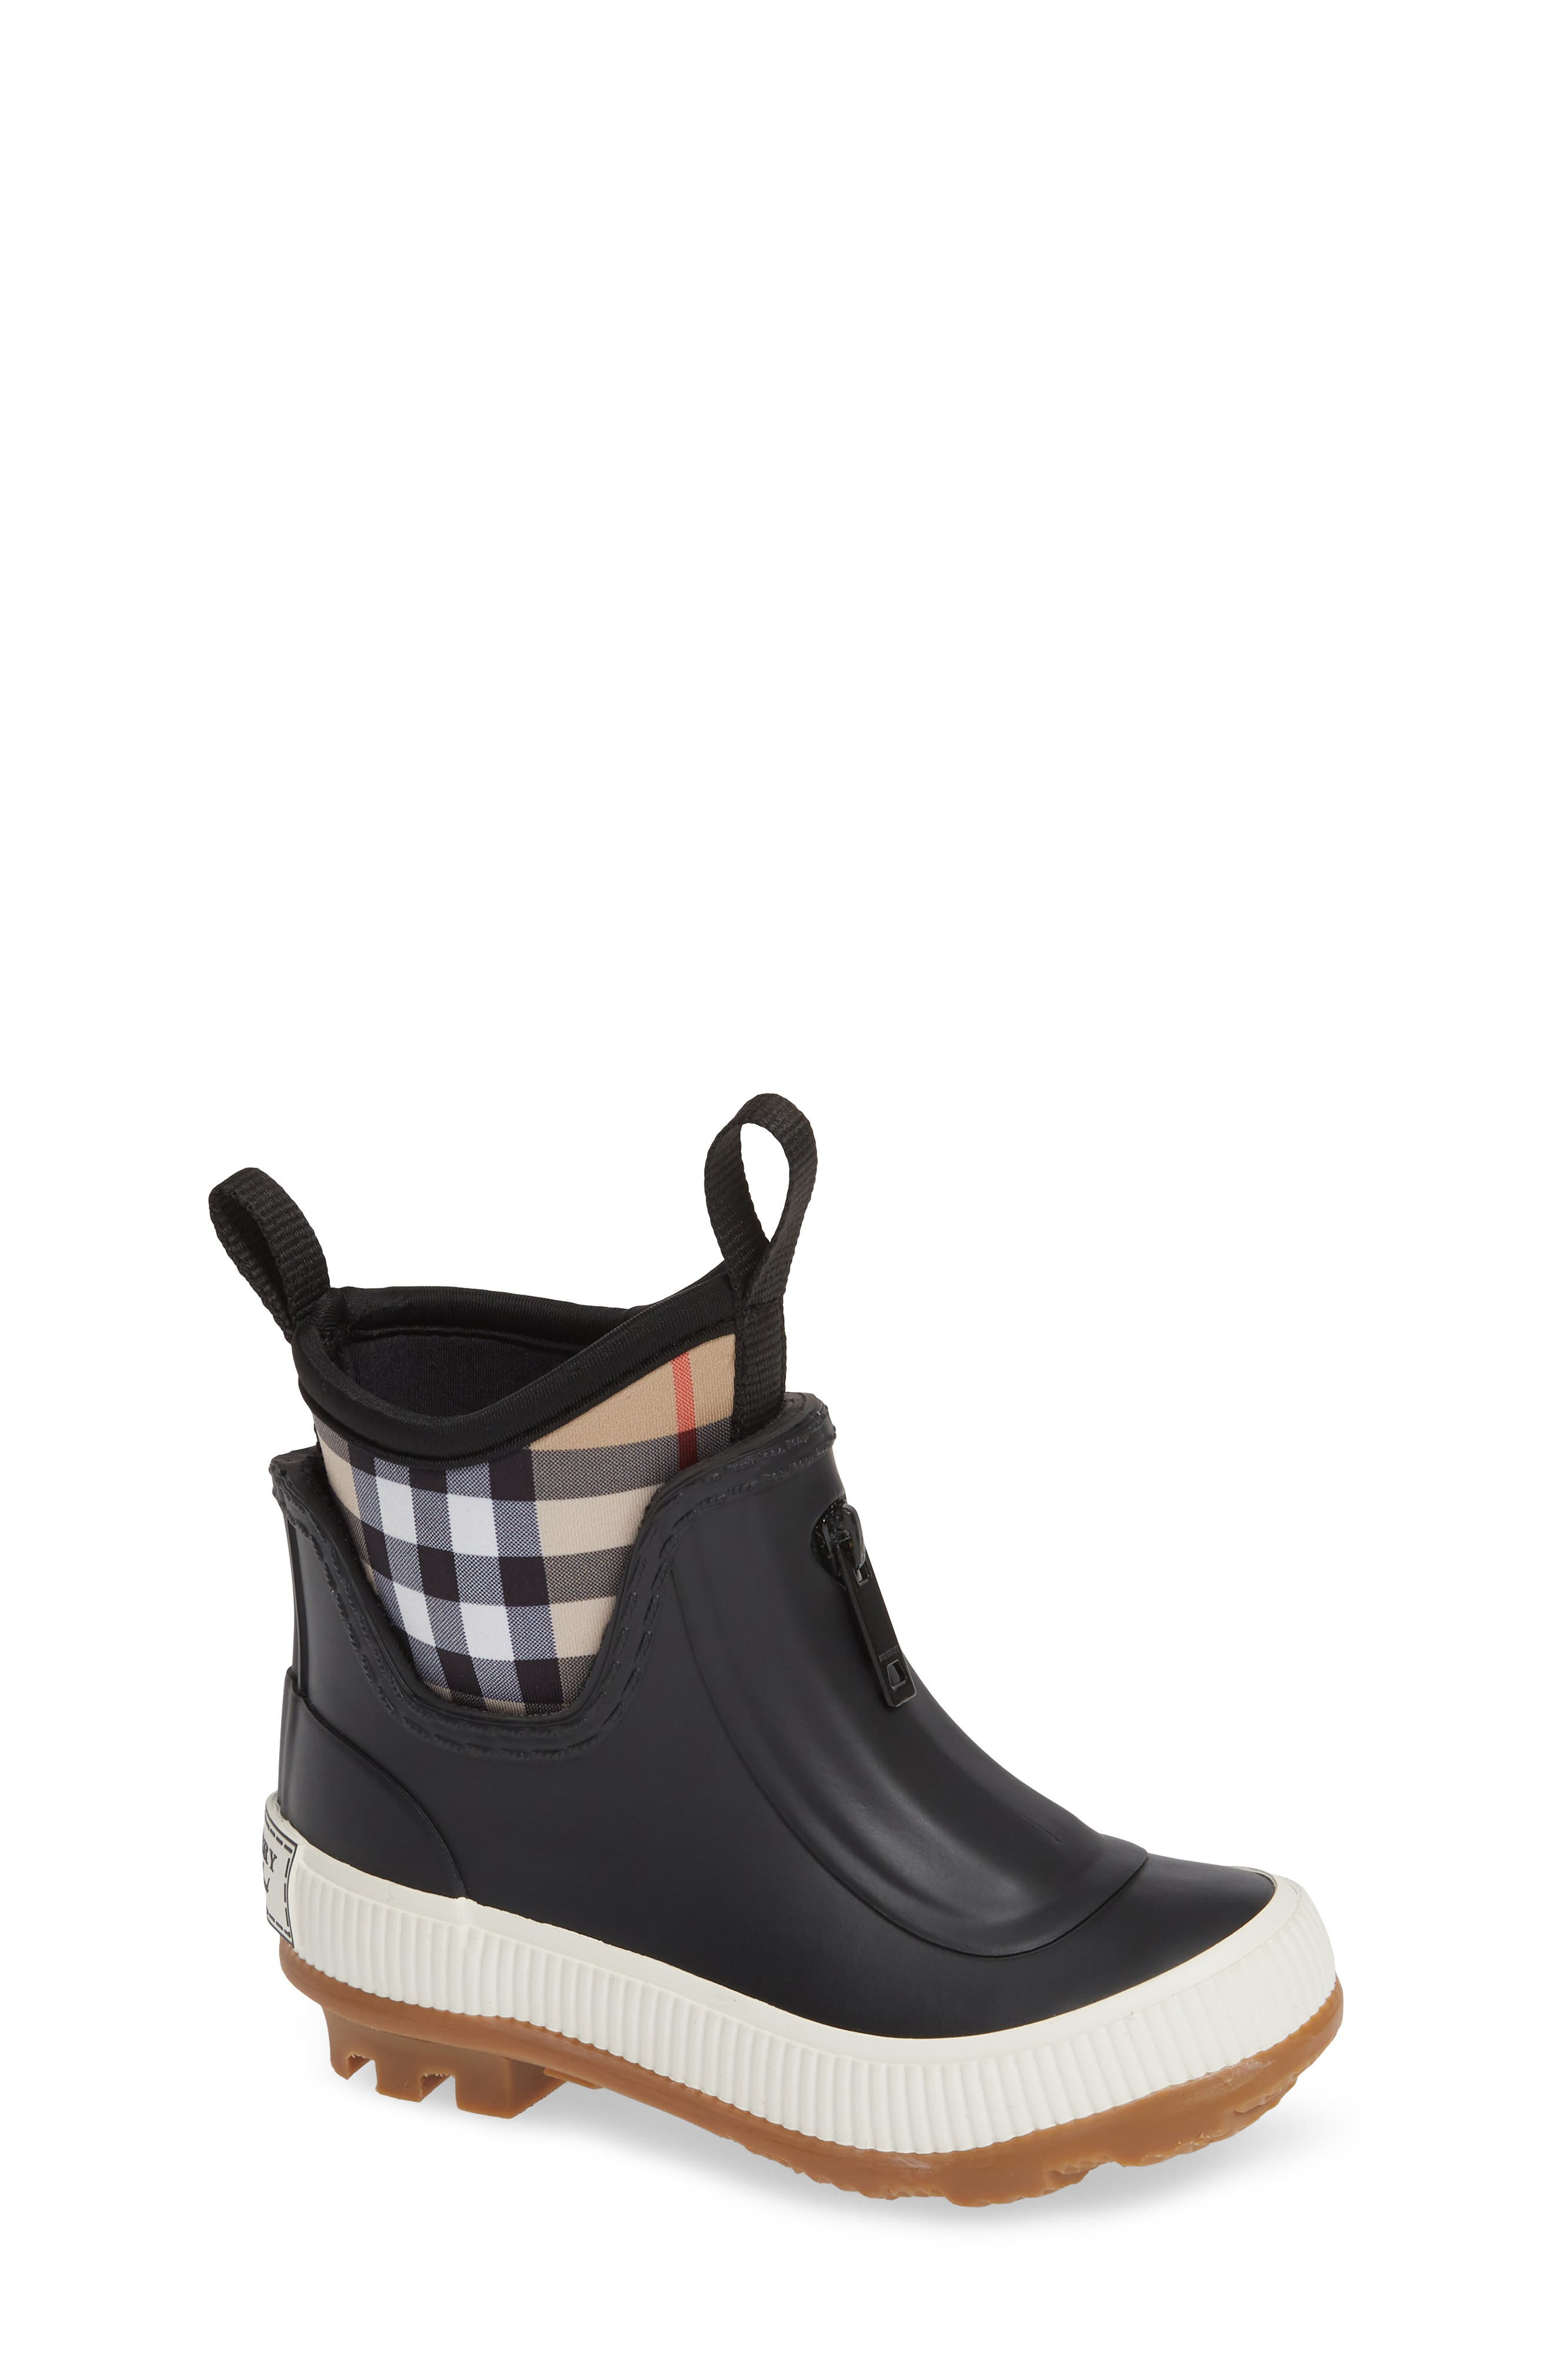 BURBERRY Flinton Waterproof Rain Boot, Main, color, BLACK